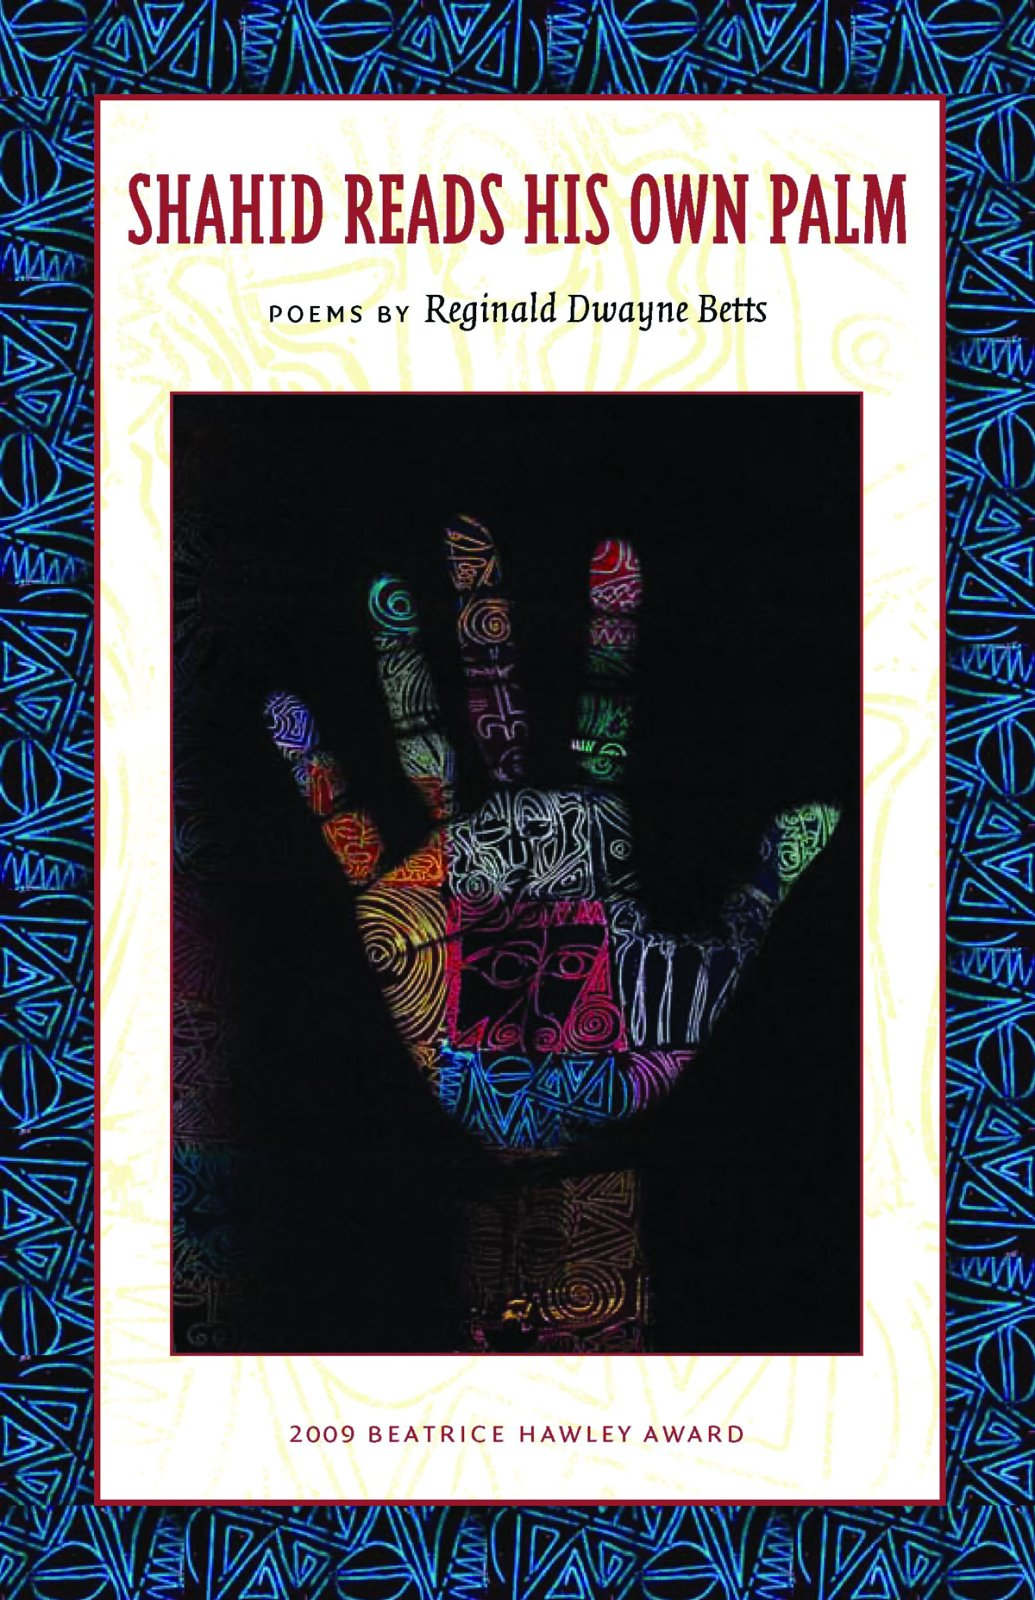 Shahid Reads His Own Palm_Reginald Dwayne Betts